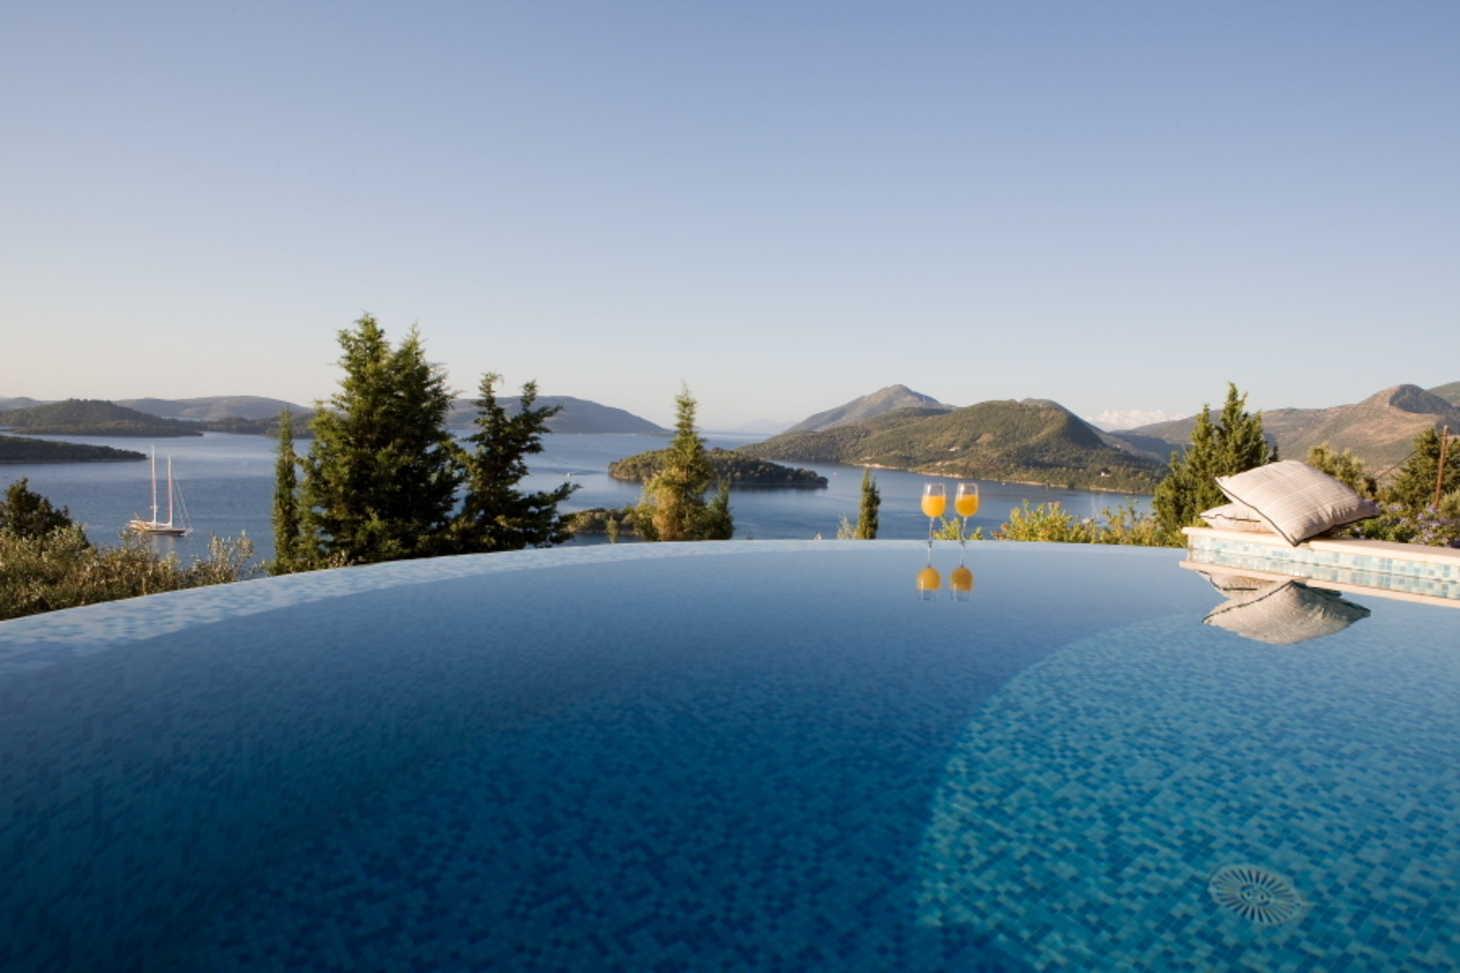 Luxury villa del sol with amazing views and a lefkada for Villas del sol